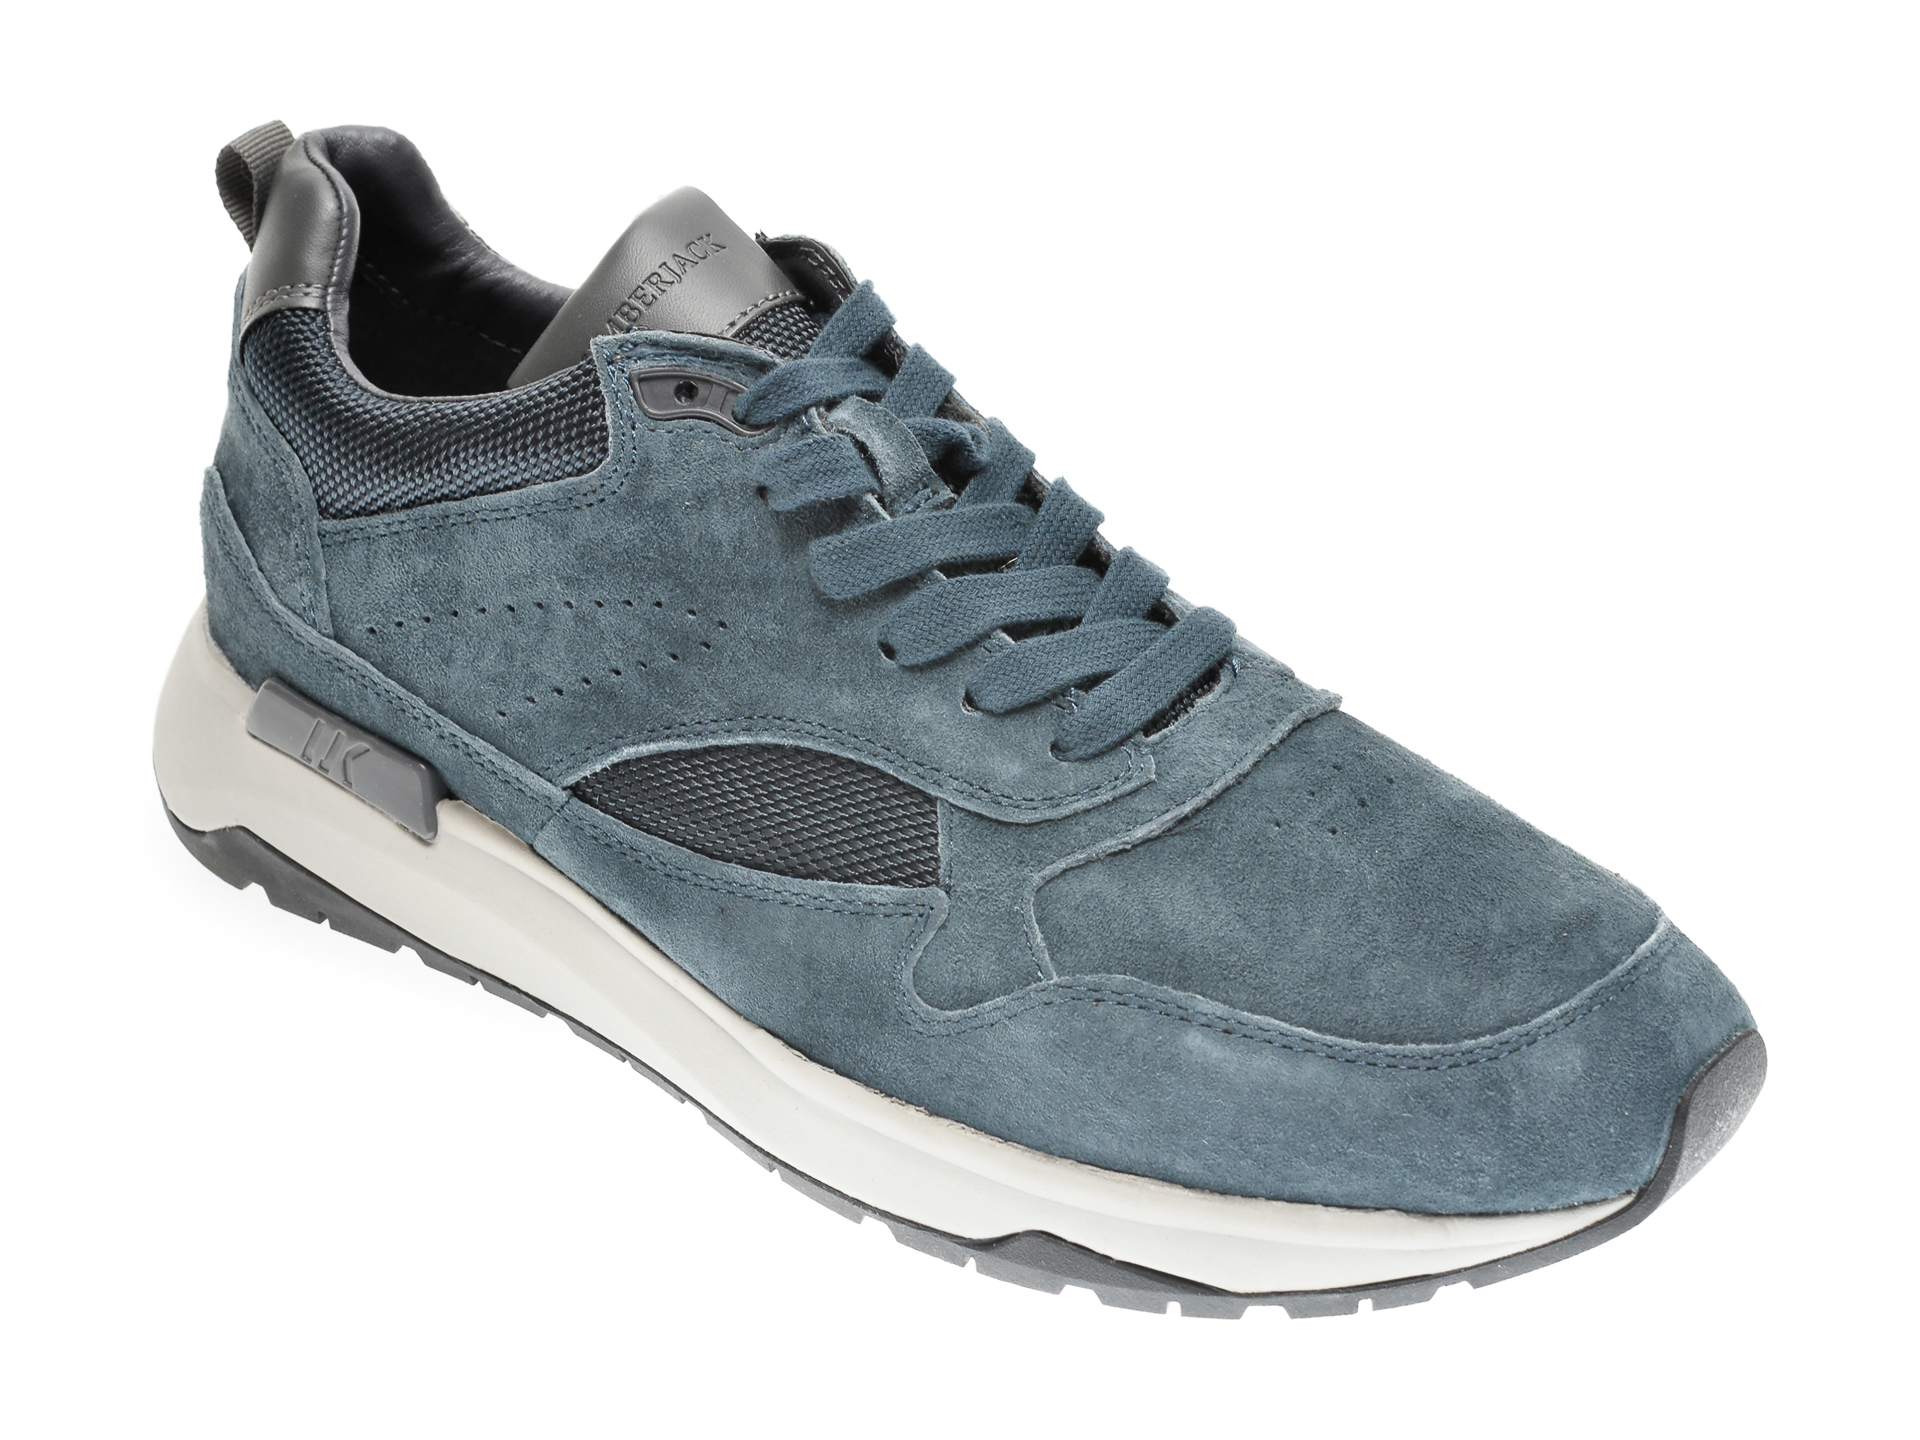 Pantofi LUMBERJACK bleumarin, 405006, din piele intoarsa imagine